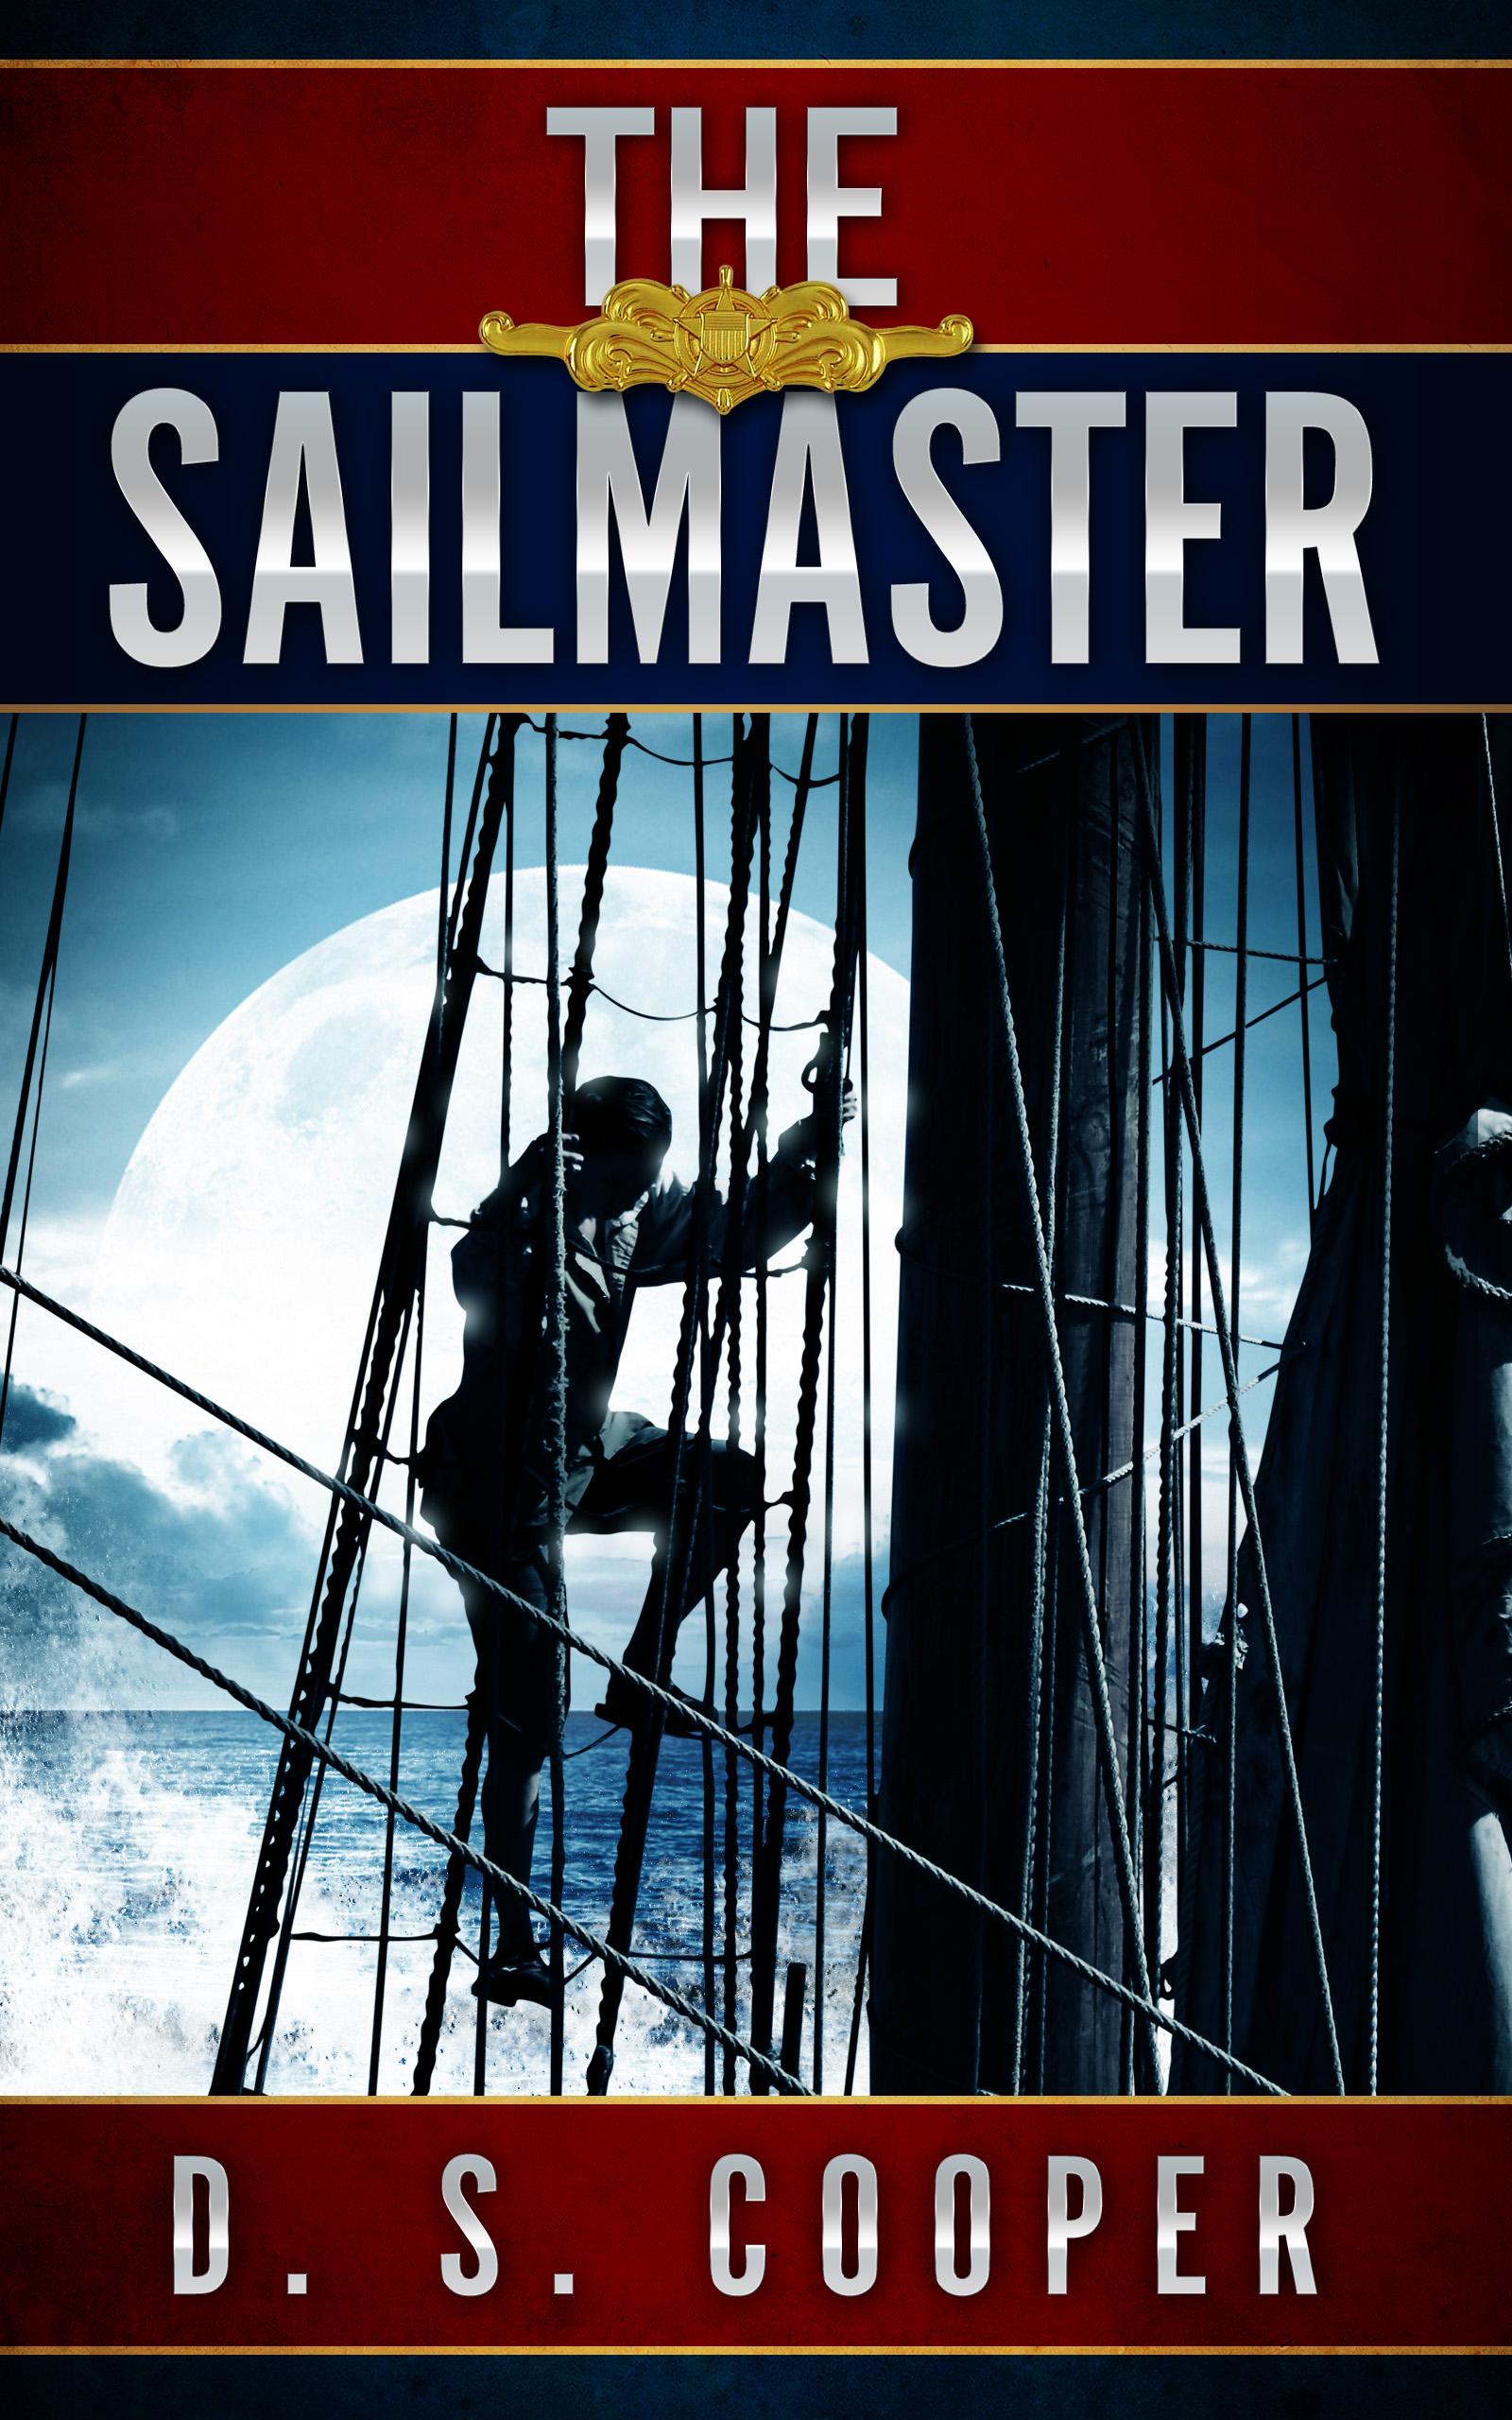 Sailmaster eCover